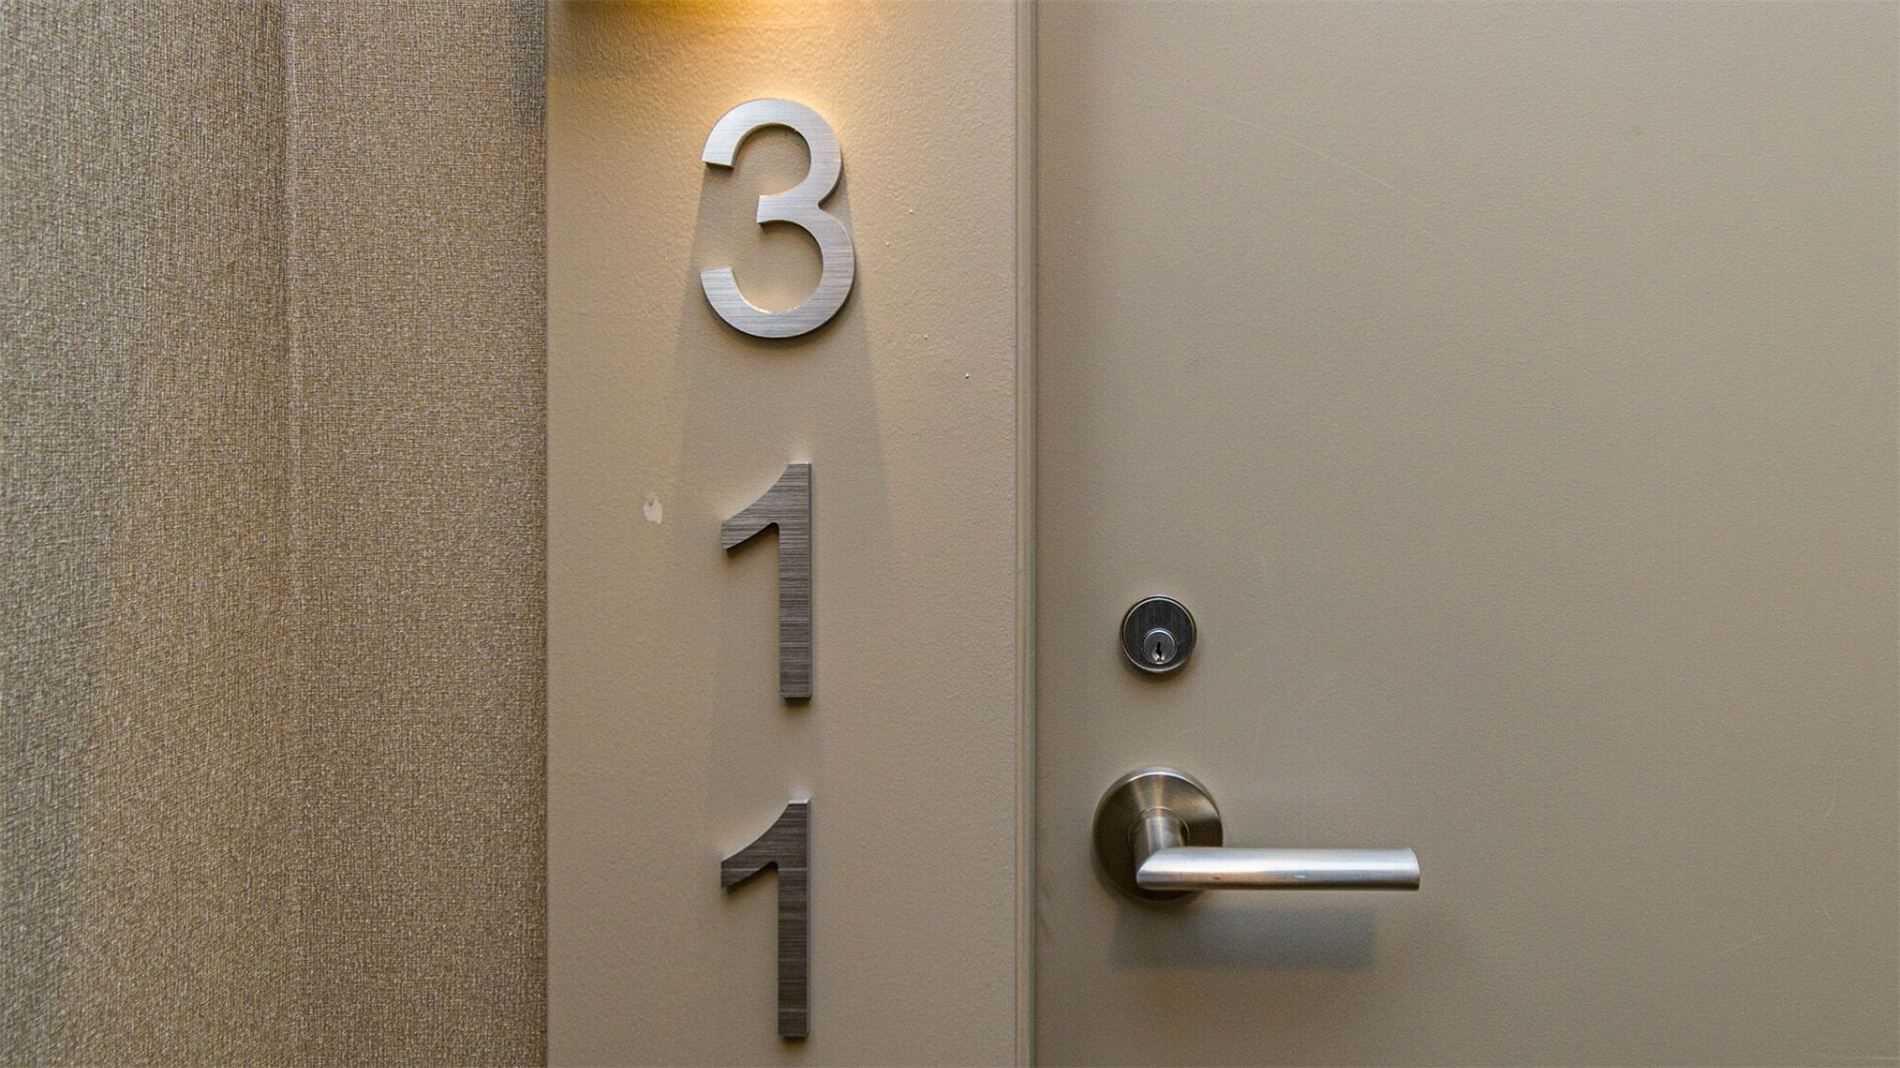 2 Sonic Way, Toronto, Ontario M3C 0P1, 3 Bedrooms Bedrooms, 5 Rooms Rooms,2 BathroomsBathrooms,Condo Apt,For Sale,Sonic,C5120372